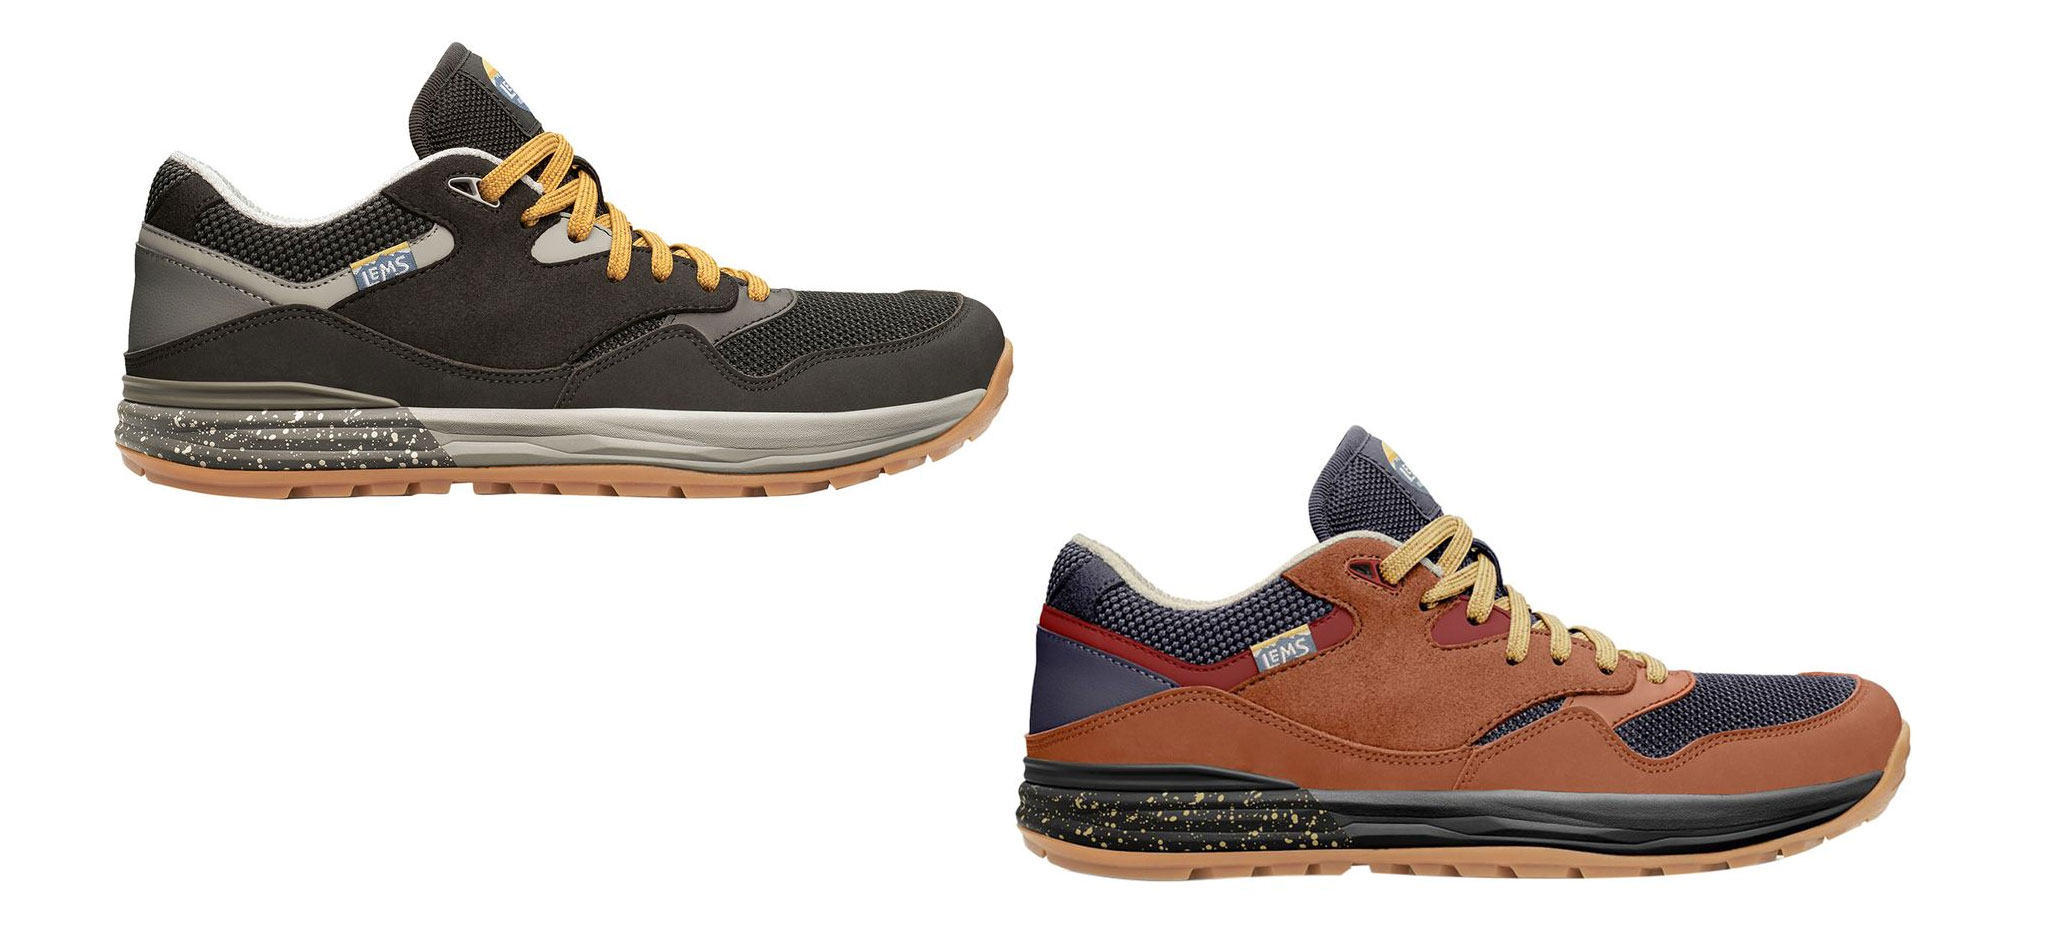 Lems Trailhead Hiking Shoe